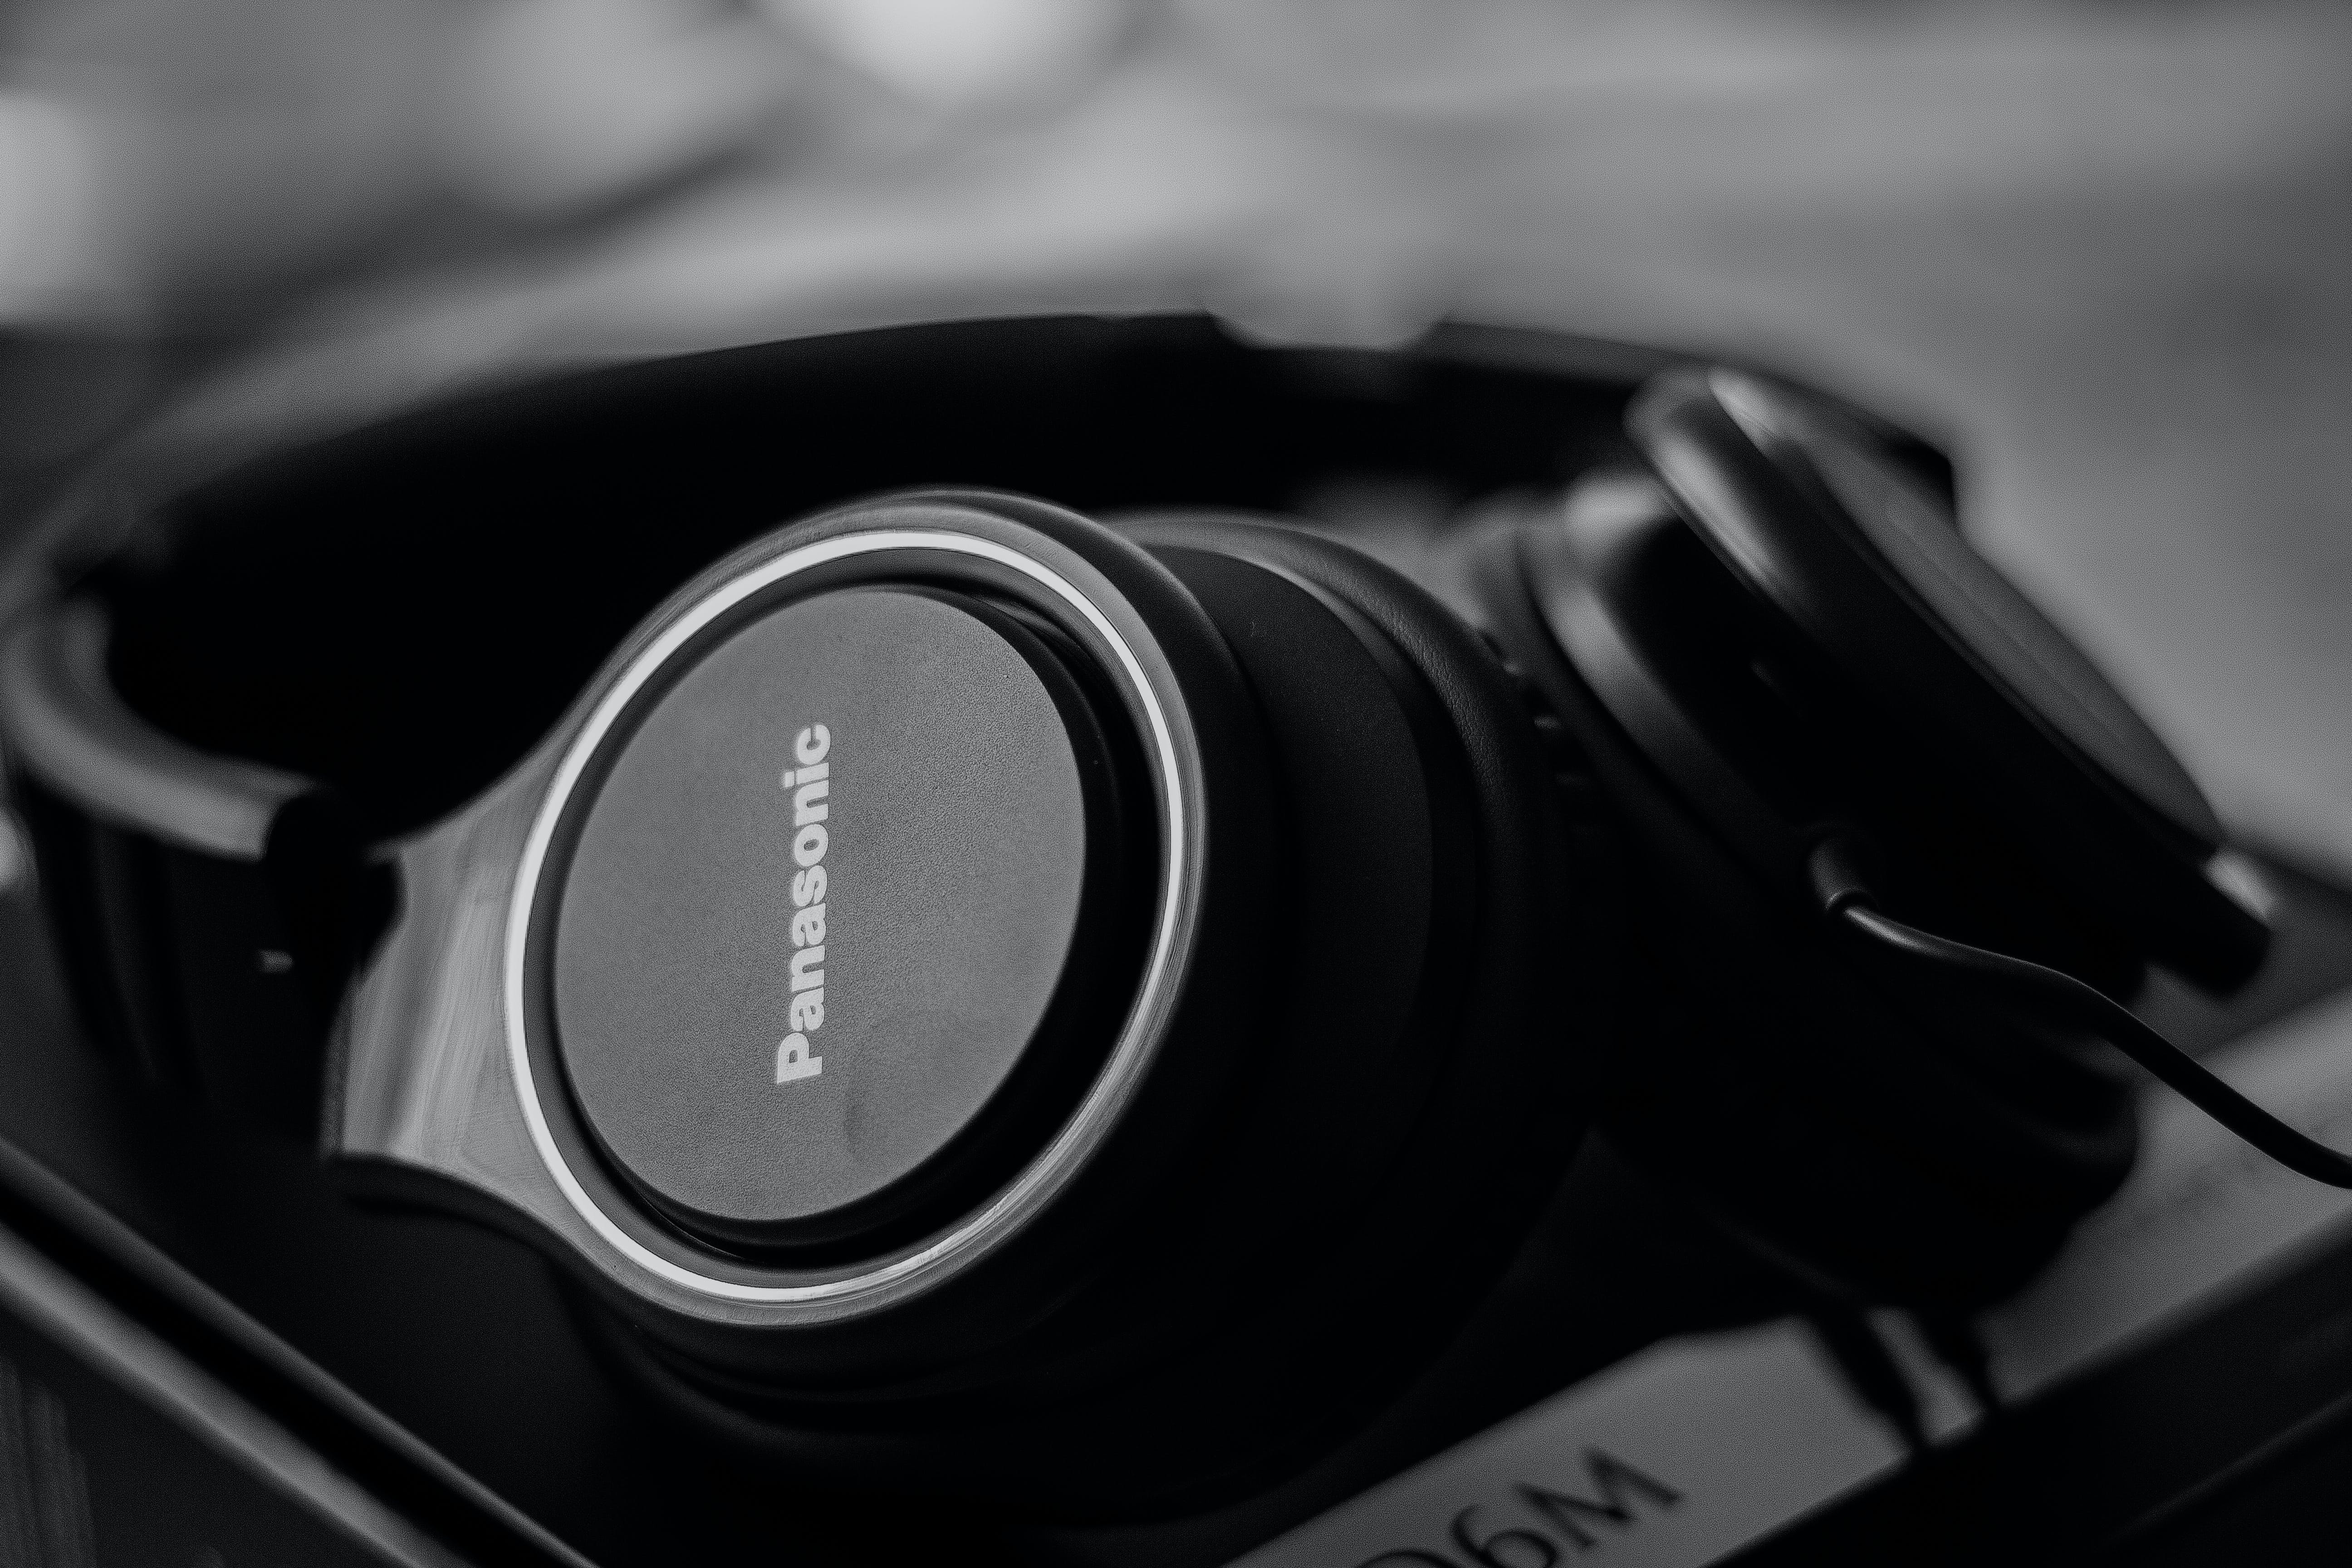 Black Panasonic Headphones